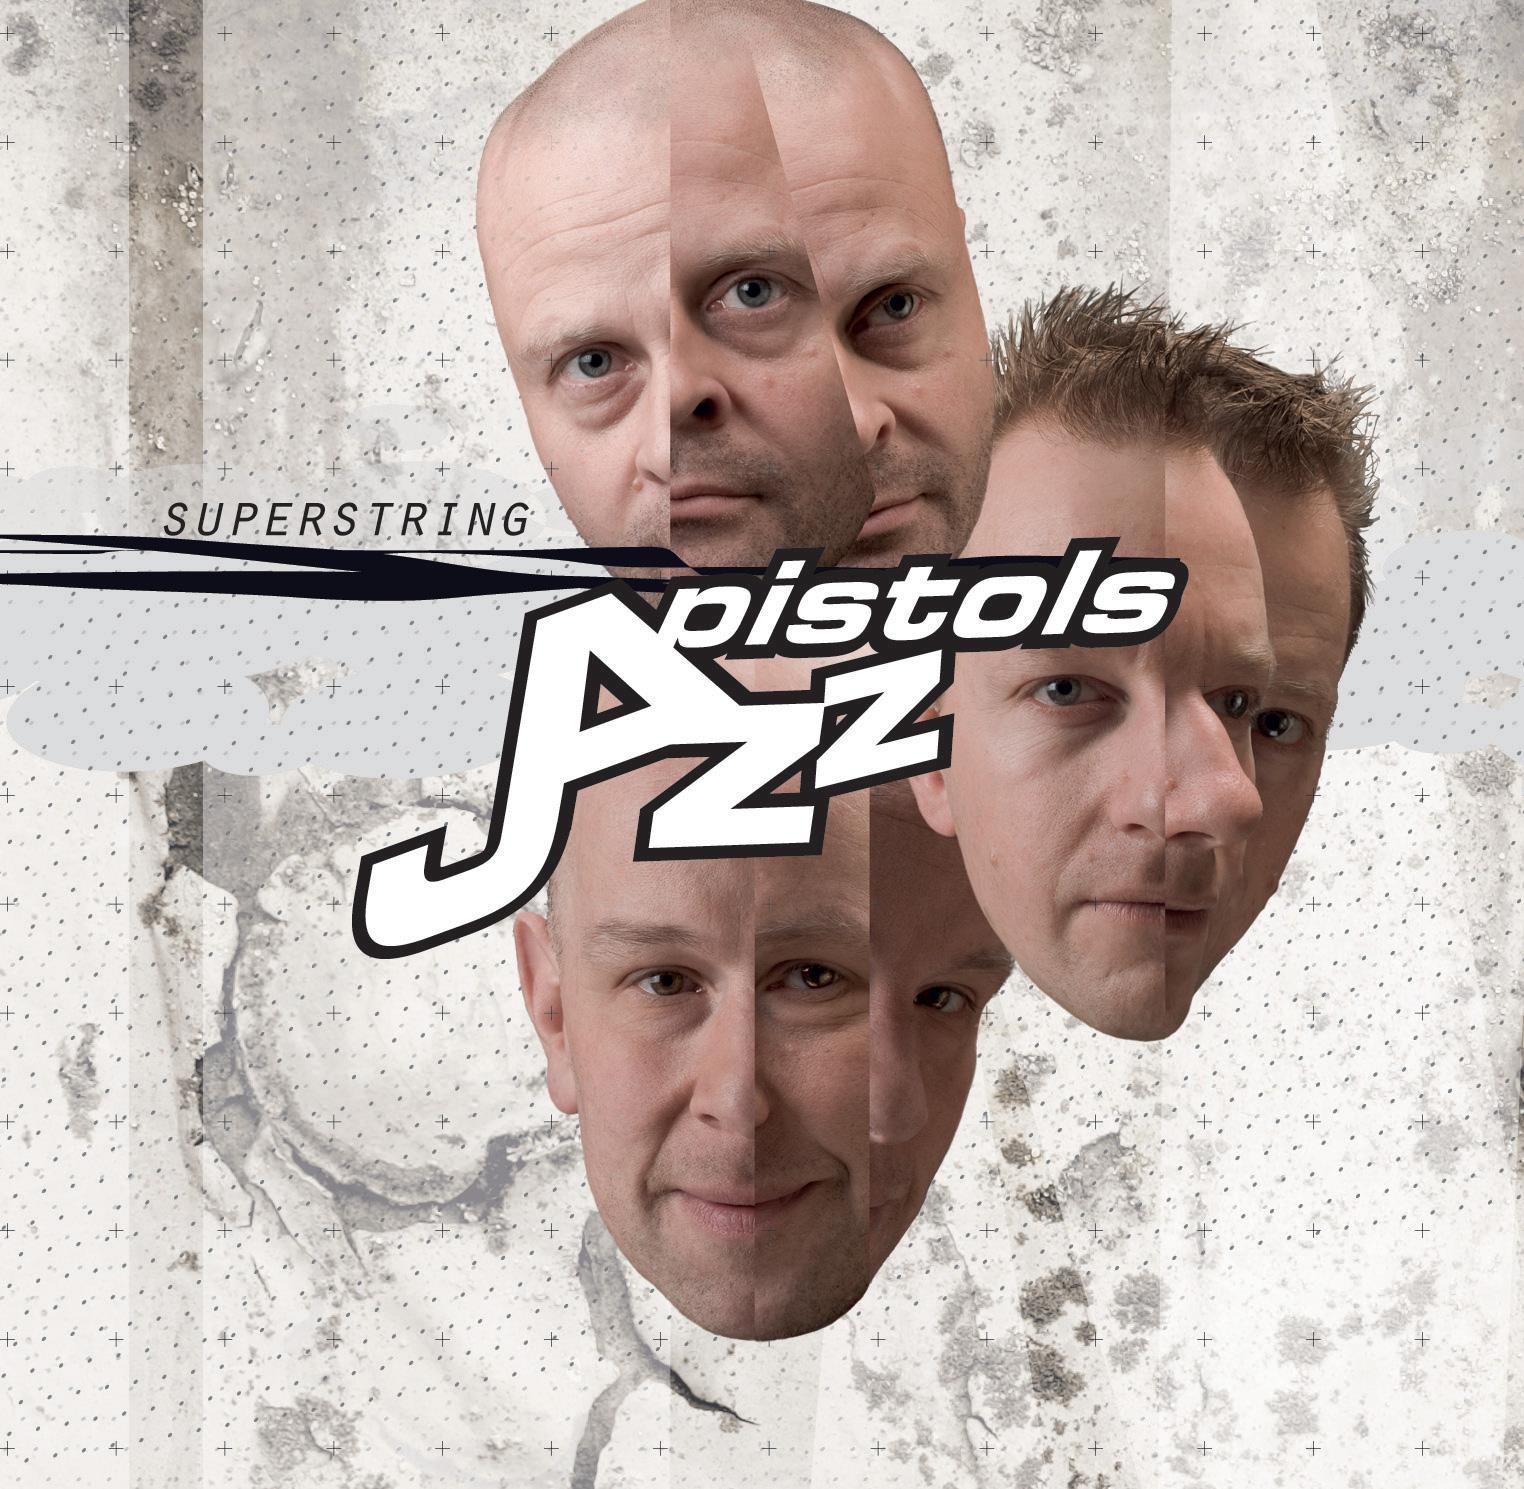 Superstring – Jazz Pistols